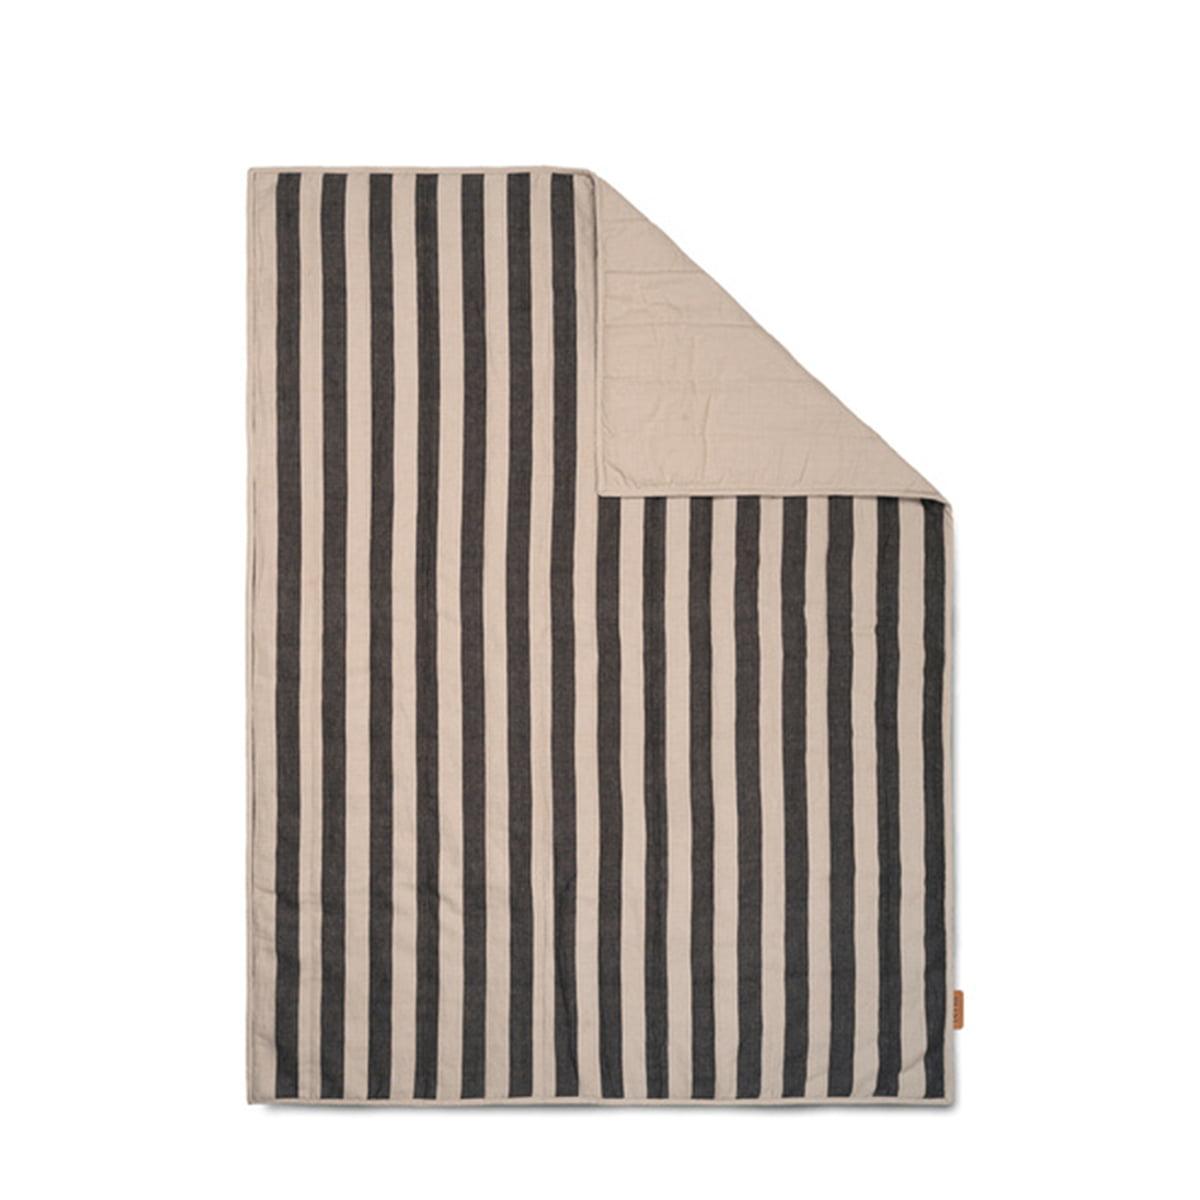 ferm LIVING - Grand Decke, 120 x 170 cm, sand / schwarz